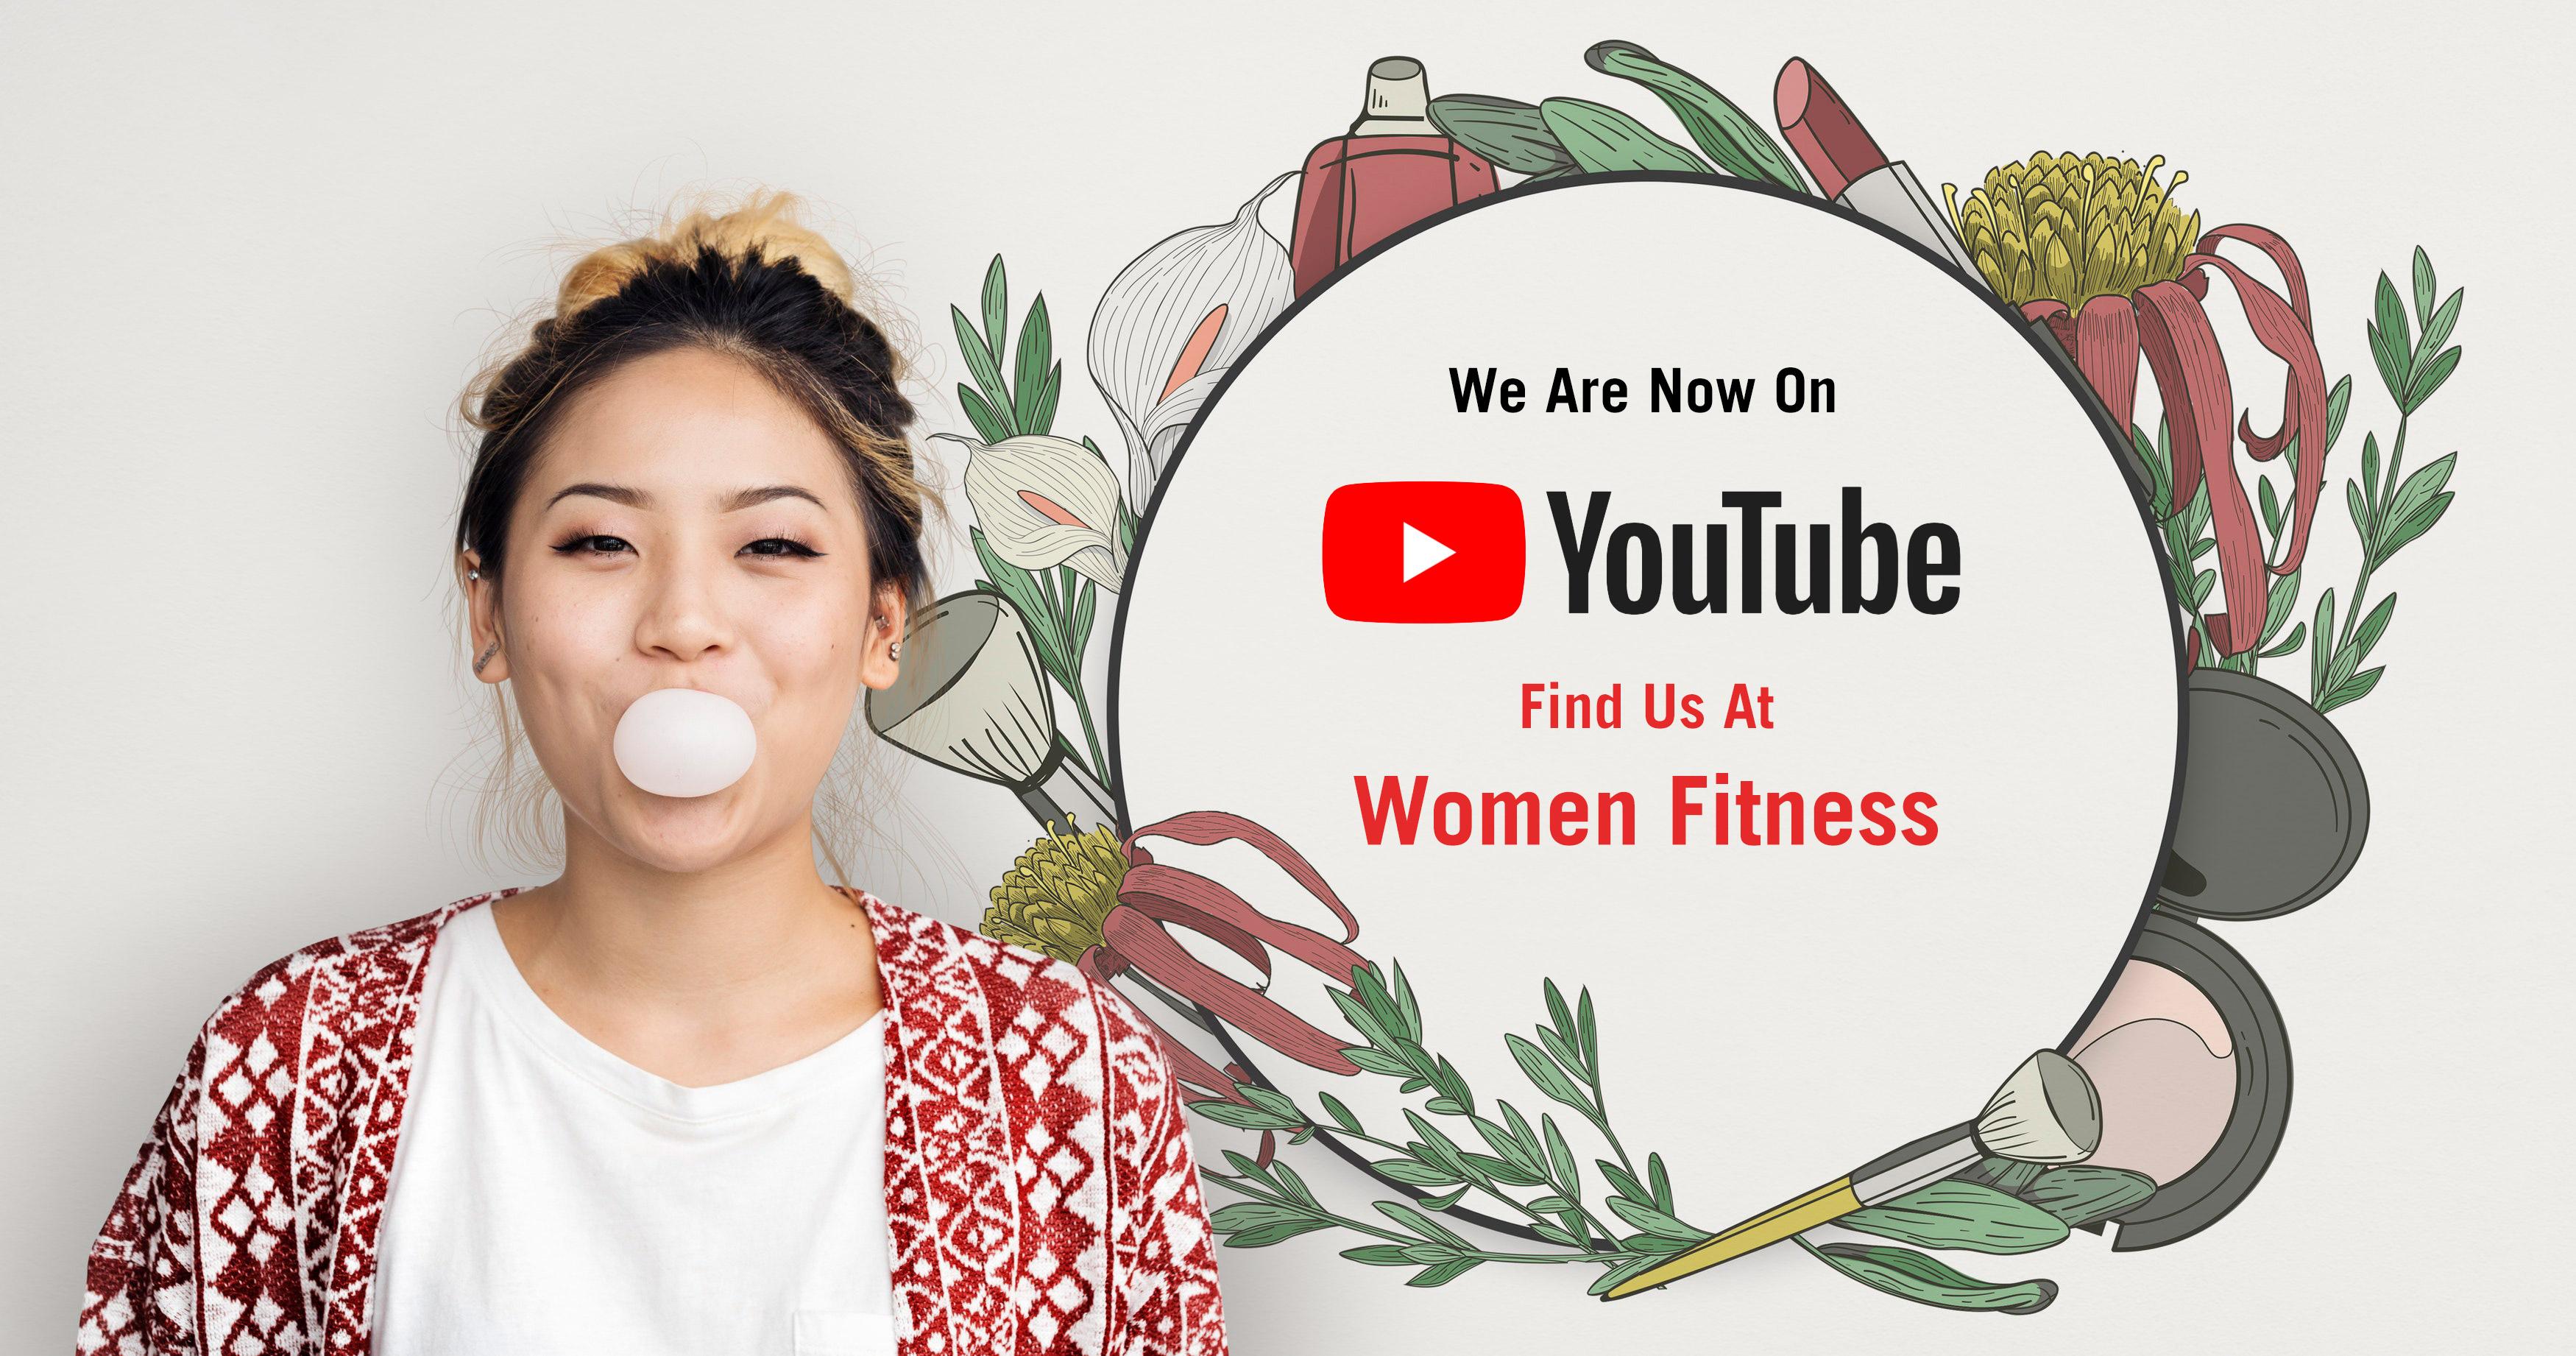 Women Fitness on Youtube